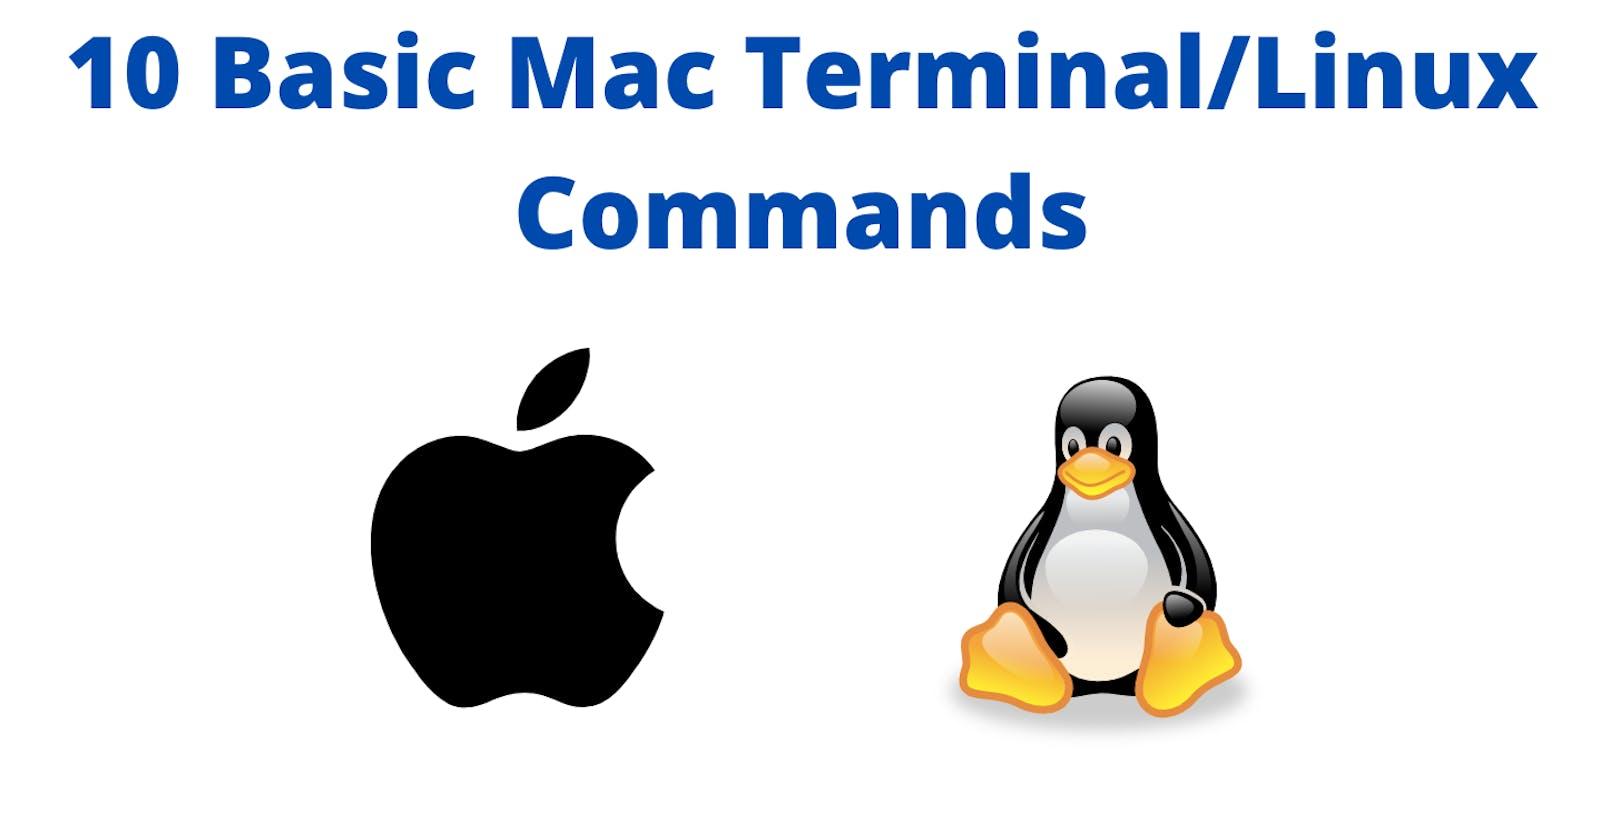 10 Basic Mac Terminal/Linux commands